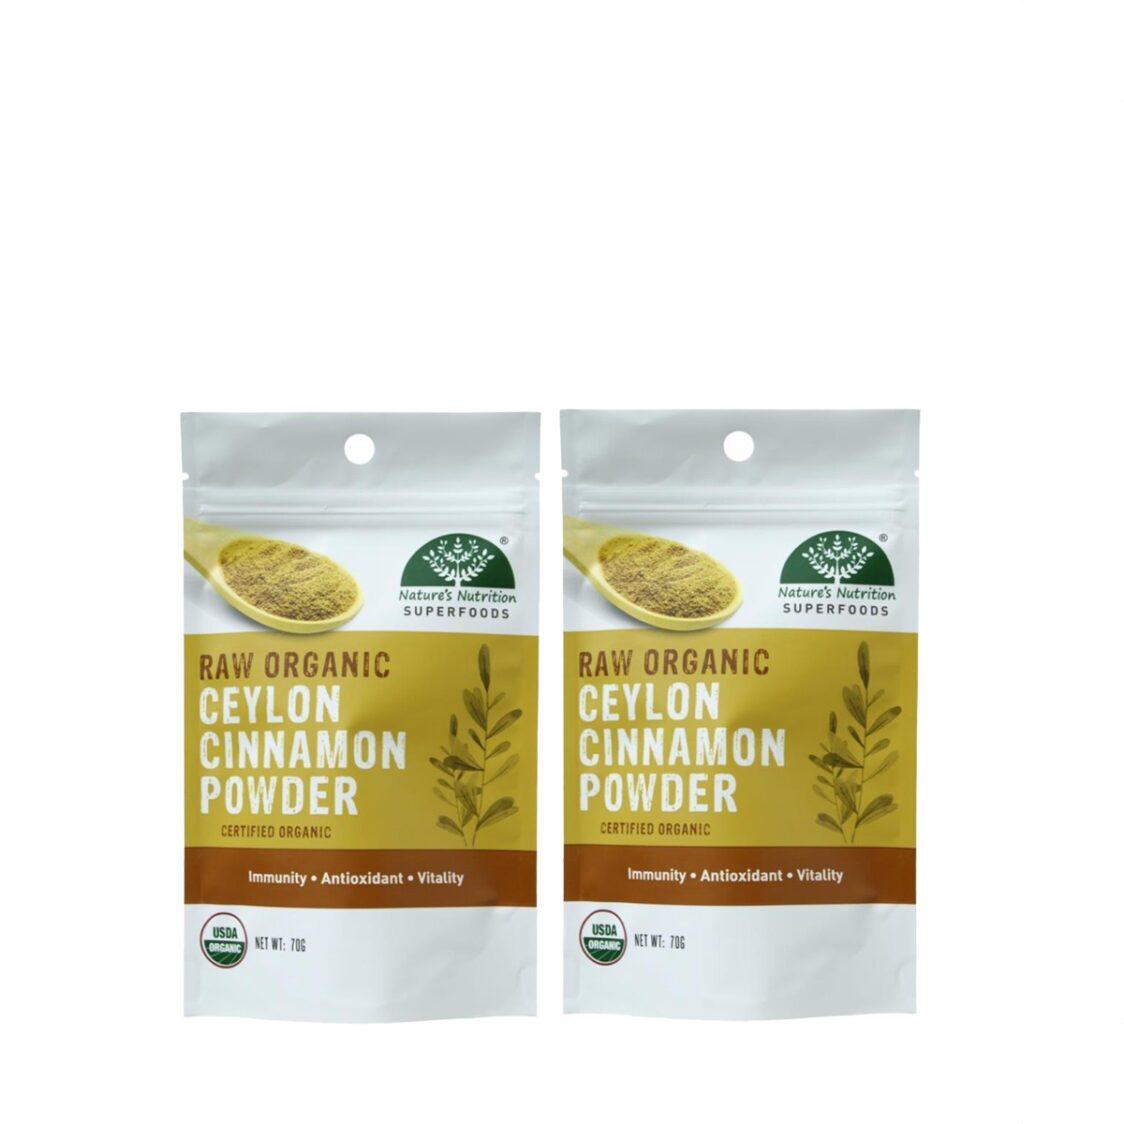 Natures Nutrition Organic Ceylon Cinnamon Powder 70g Bundle of 2